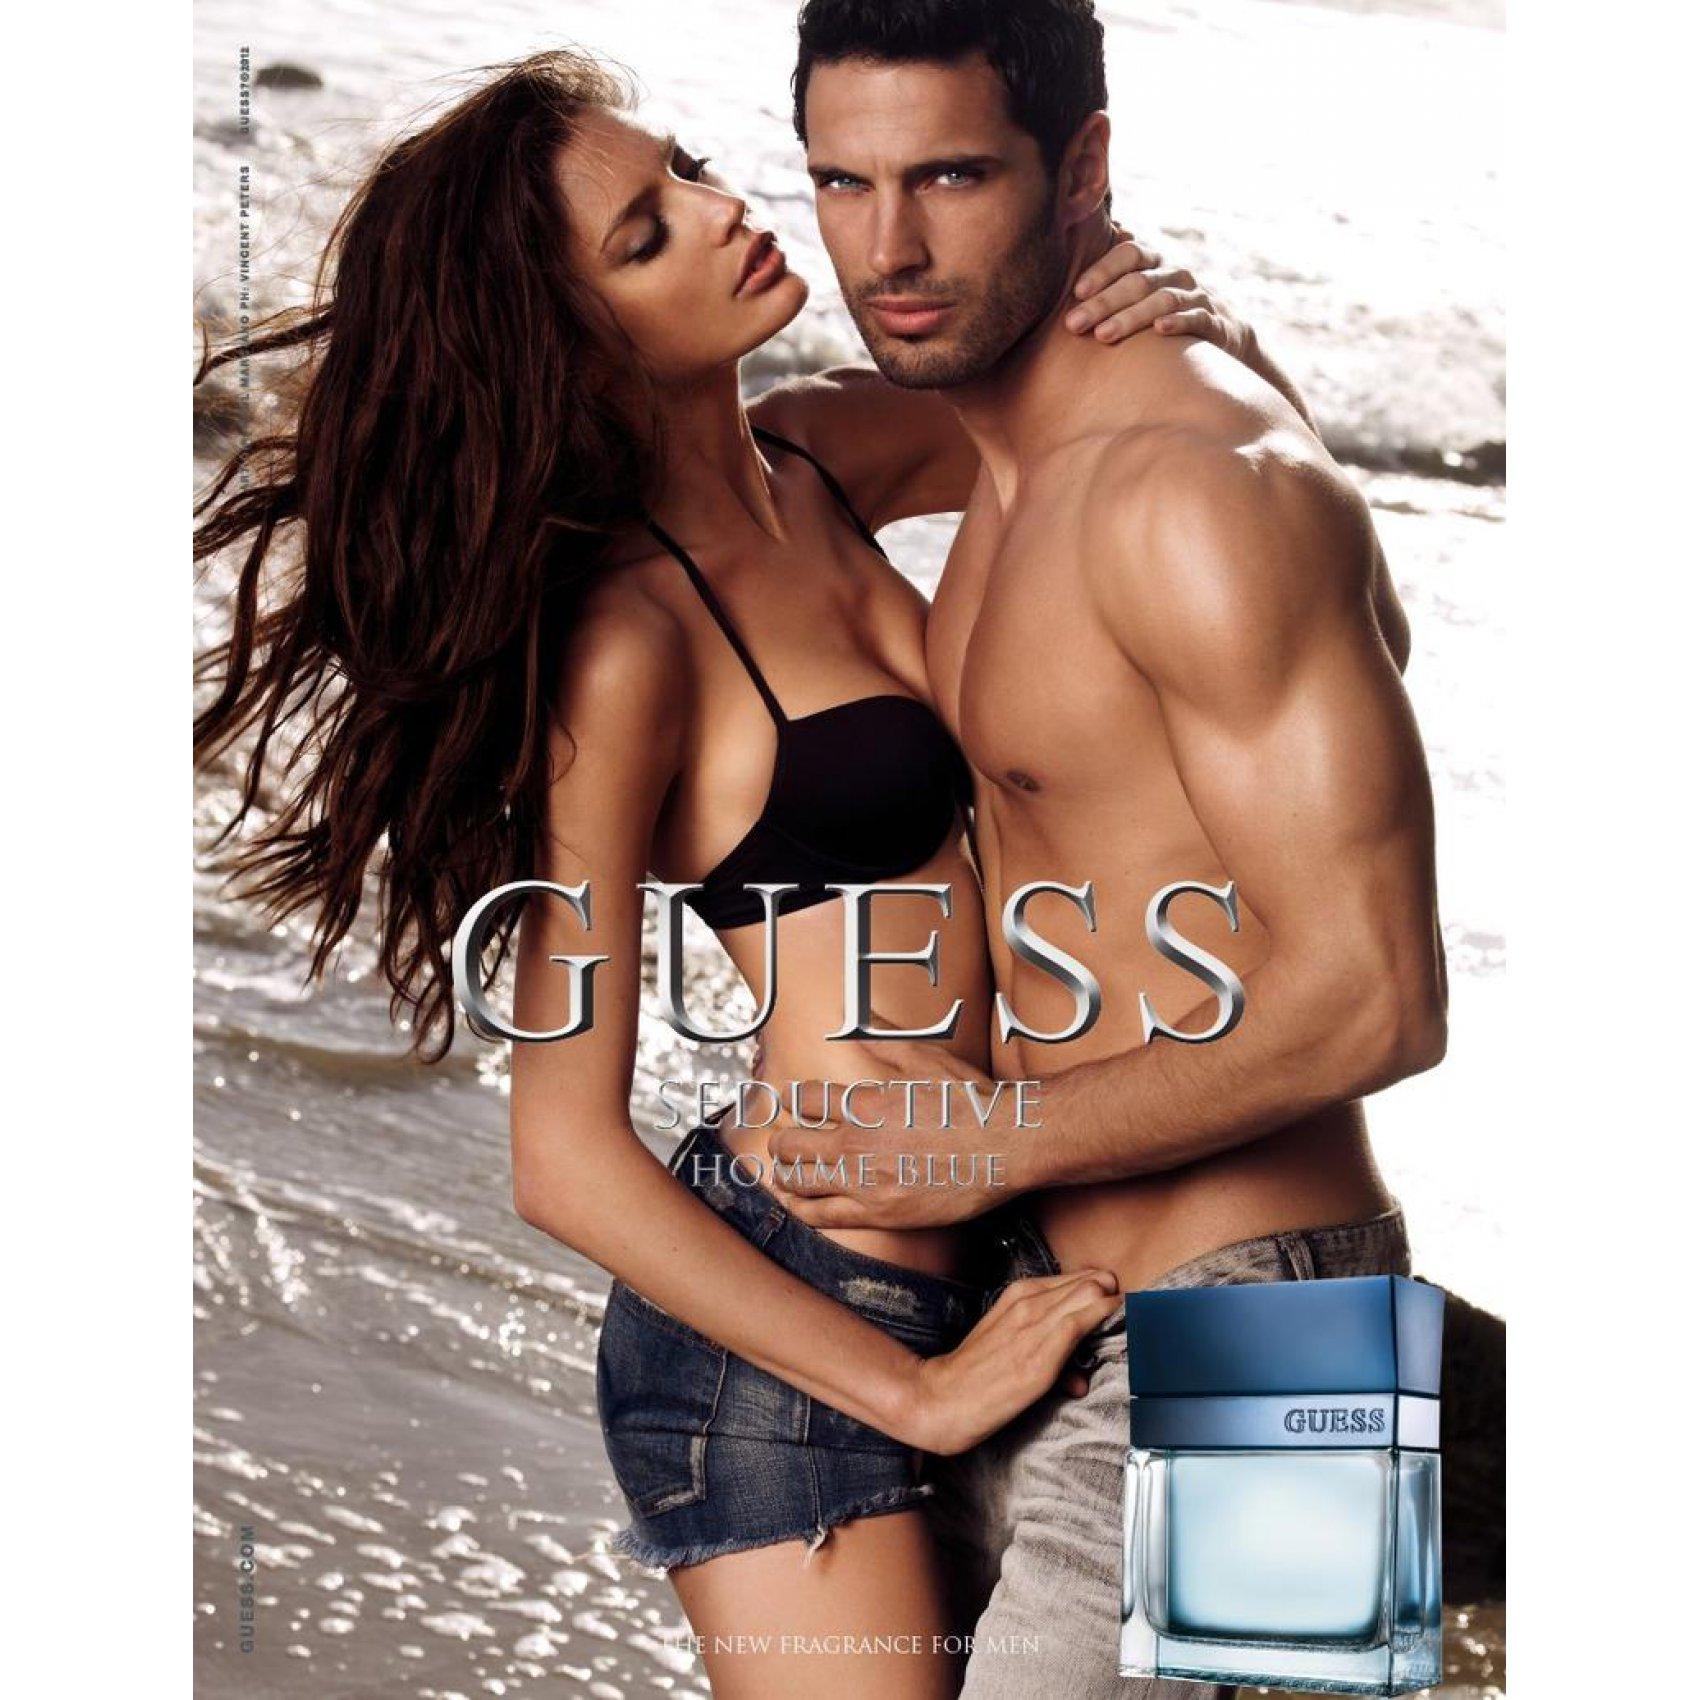 guess-seductive-homme-blue-50ml_5163c4eec6072_p_zoom.jpg